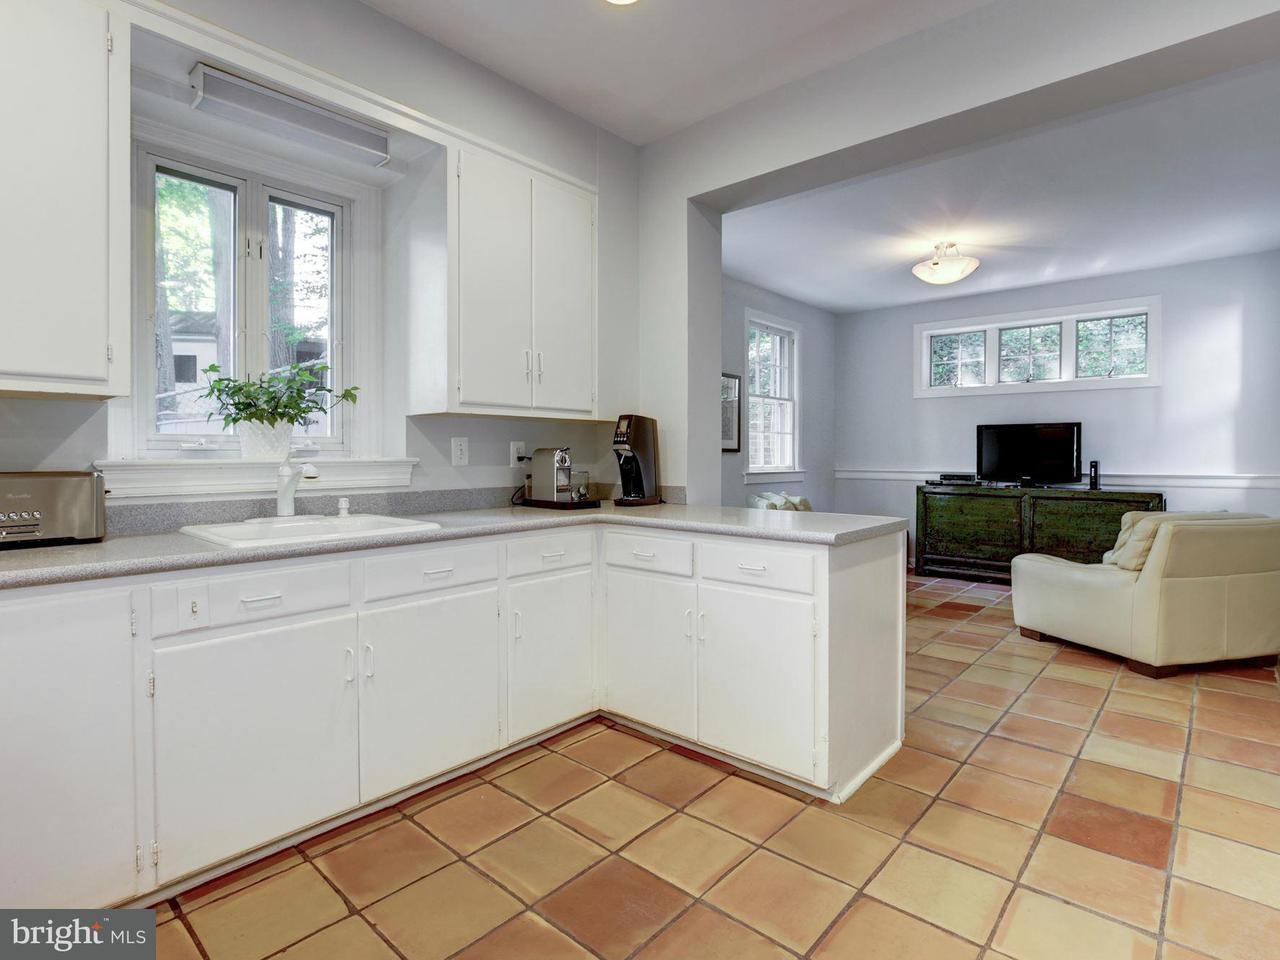 Additional photo for property listing at 3000 Woodland Dr Nw 3000 Woodland Dr Nw Washington, Distrito De Columbia 20008 Estados Unidos